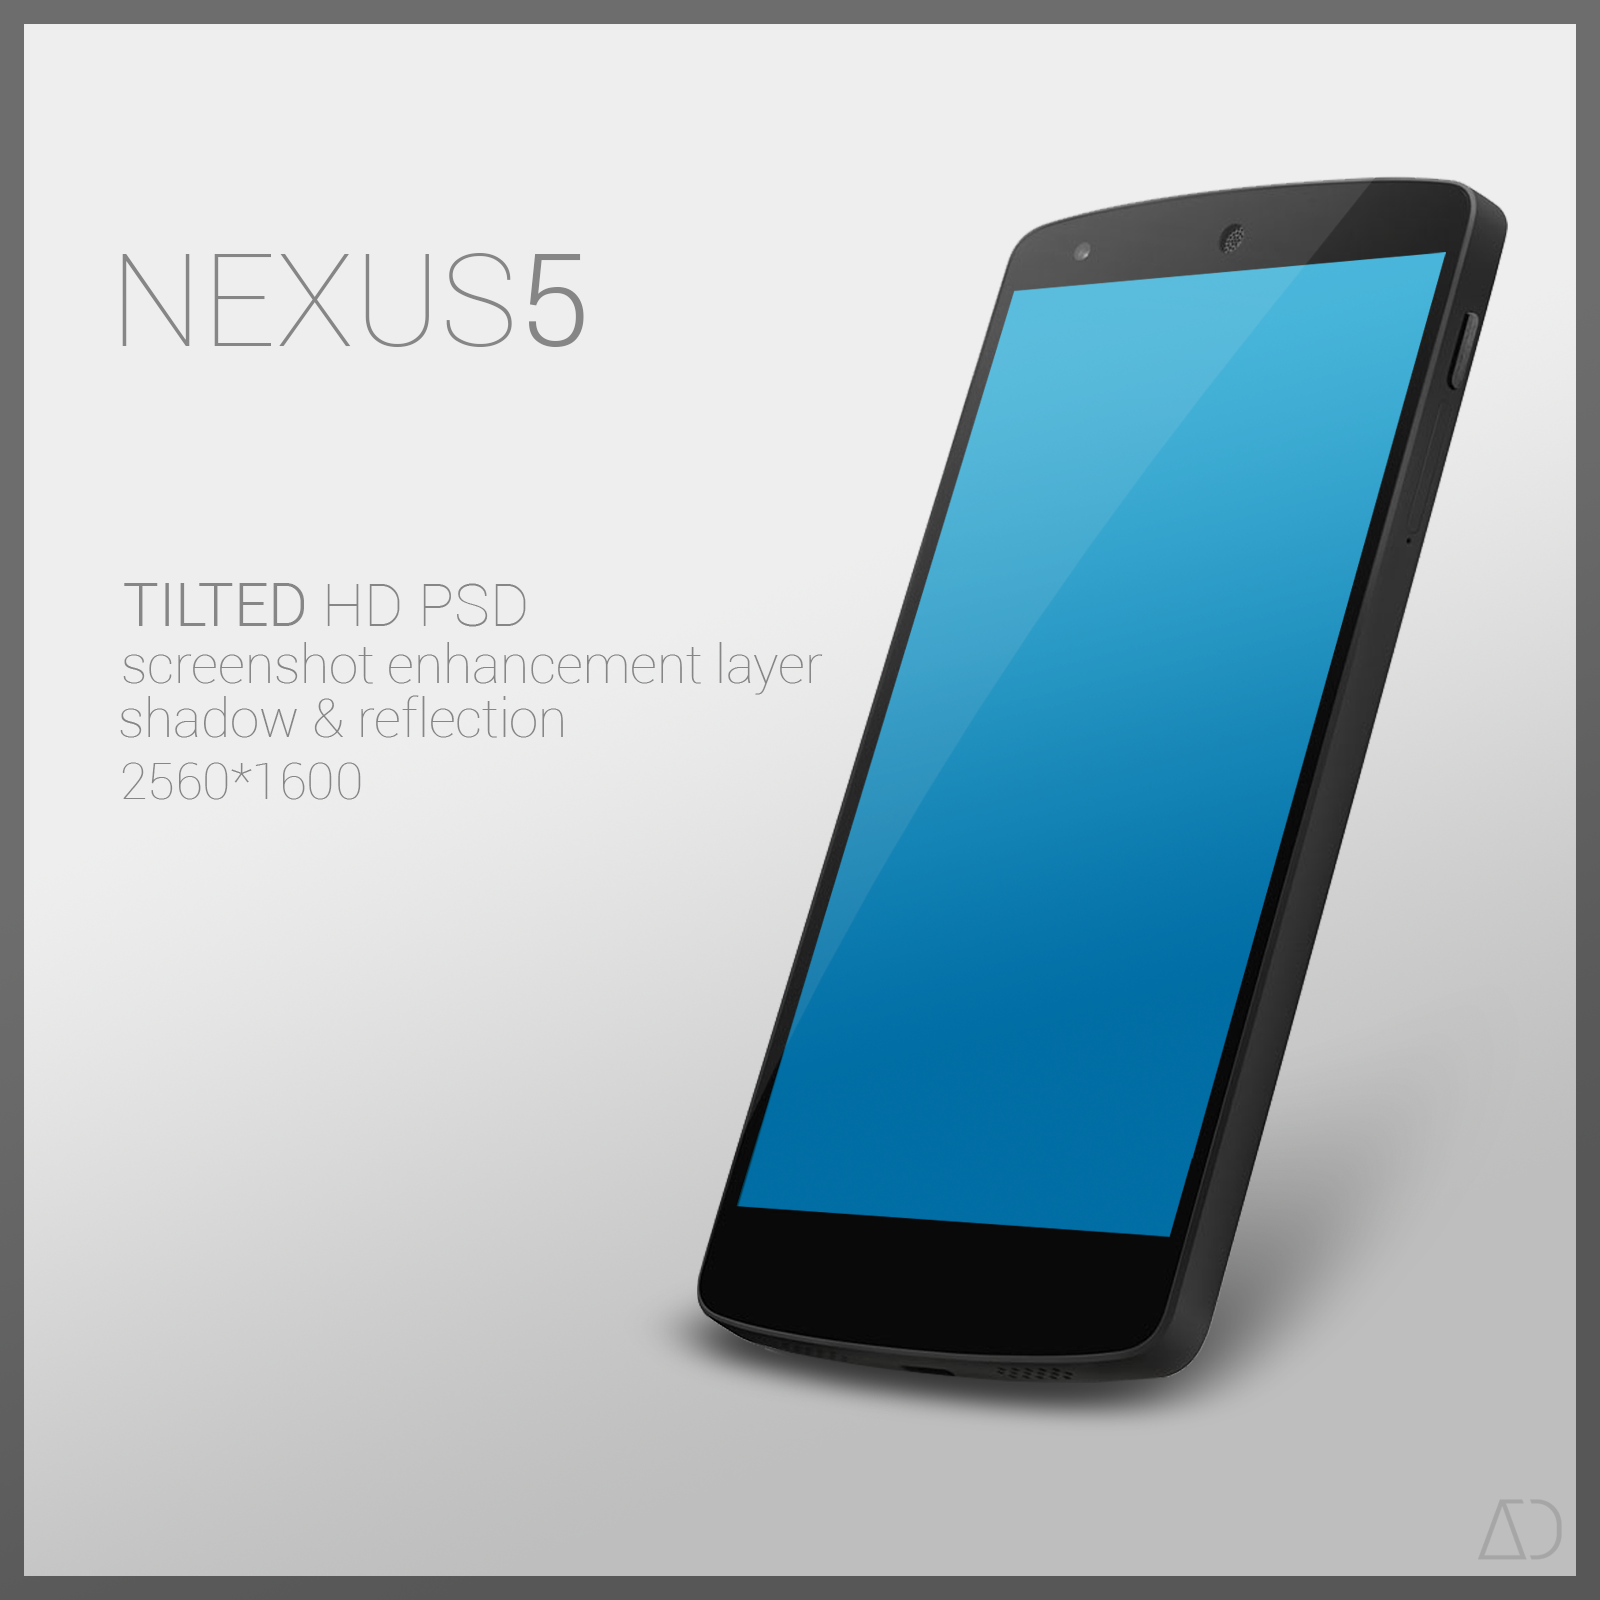 Nexus 5 : PSD [TILTED] by danishprakash